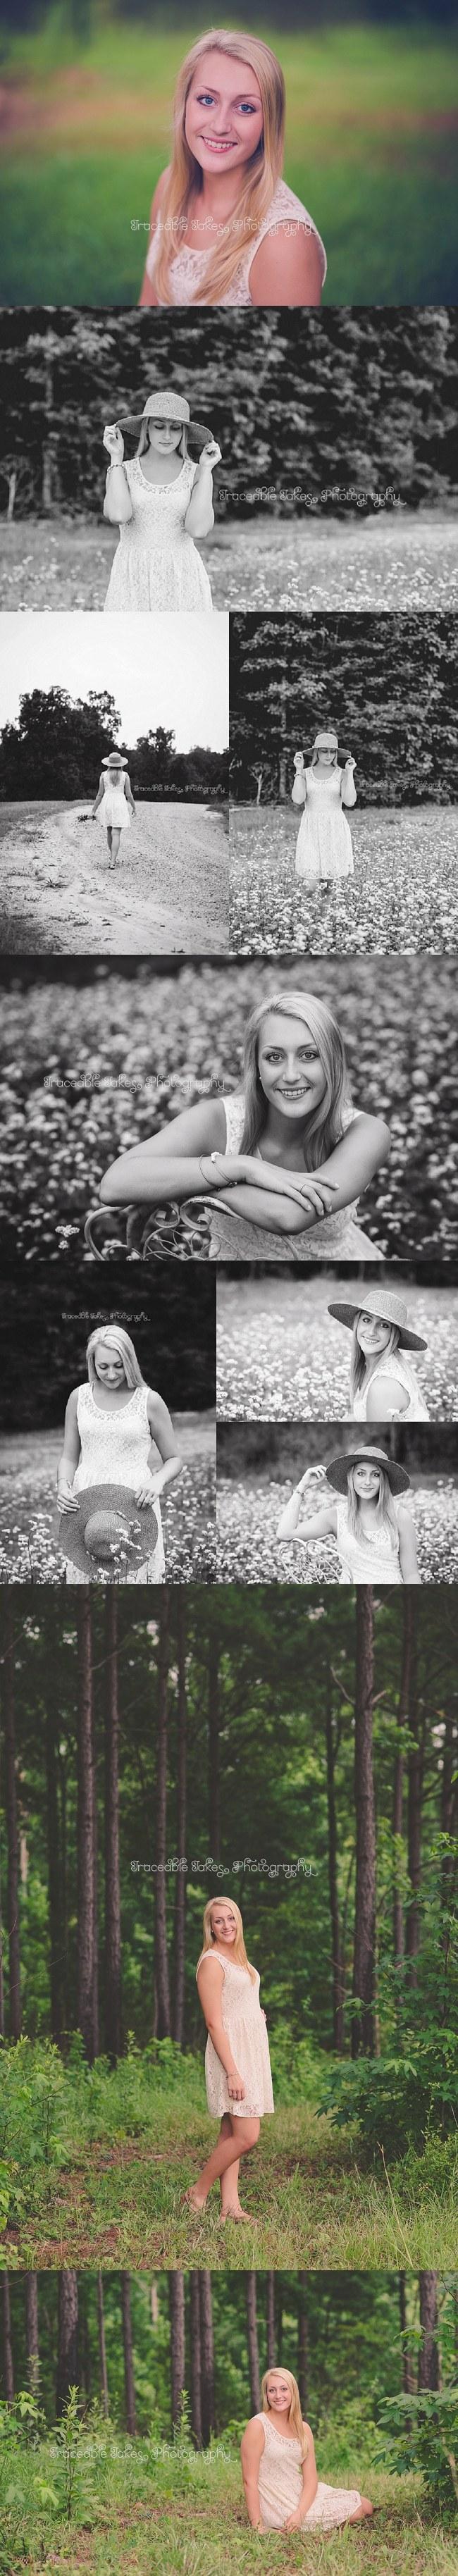 Sara Tomlin's Senior Portraits. Harris County, GA